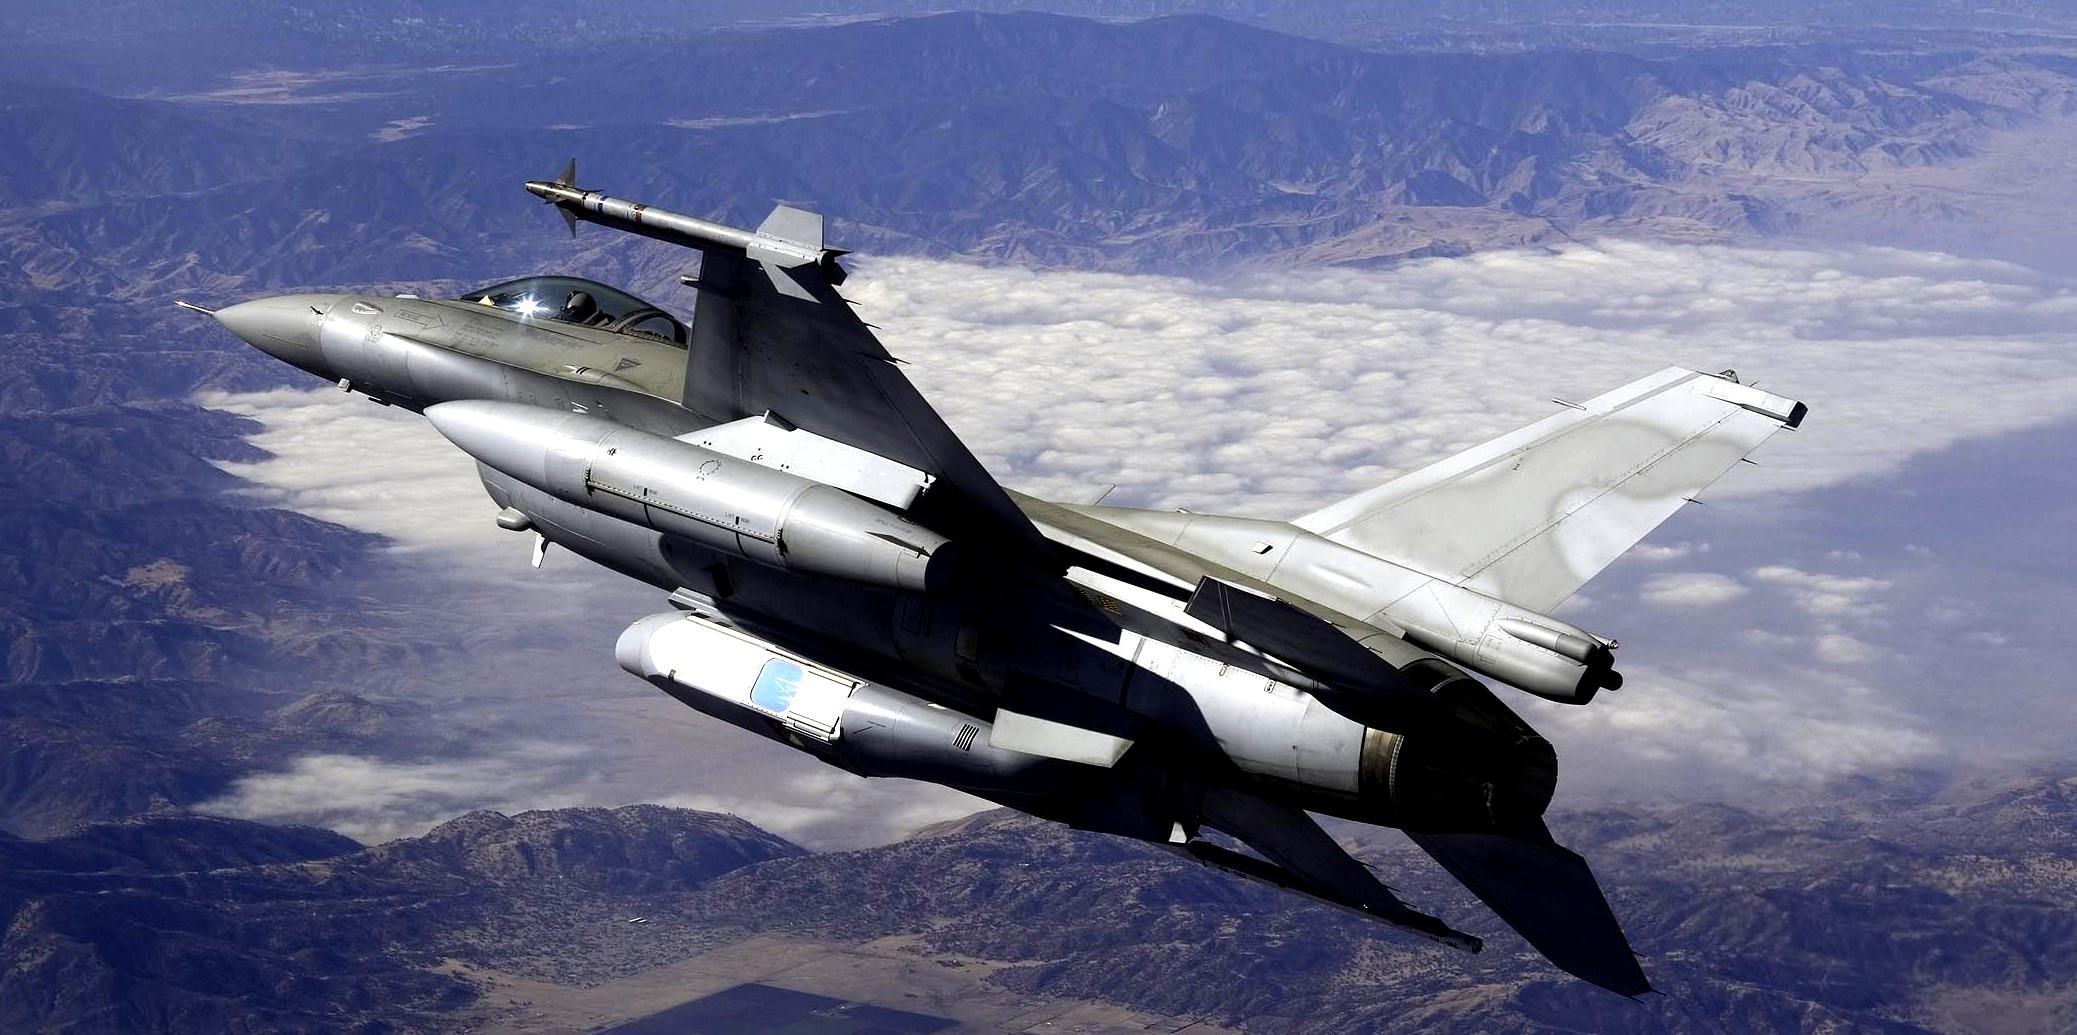 UTC Aerospace Systems - Global Leader in the Long Range Reconnaissance Market, DB-110 Reconnaissance System & TacSAR